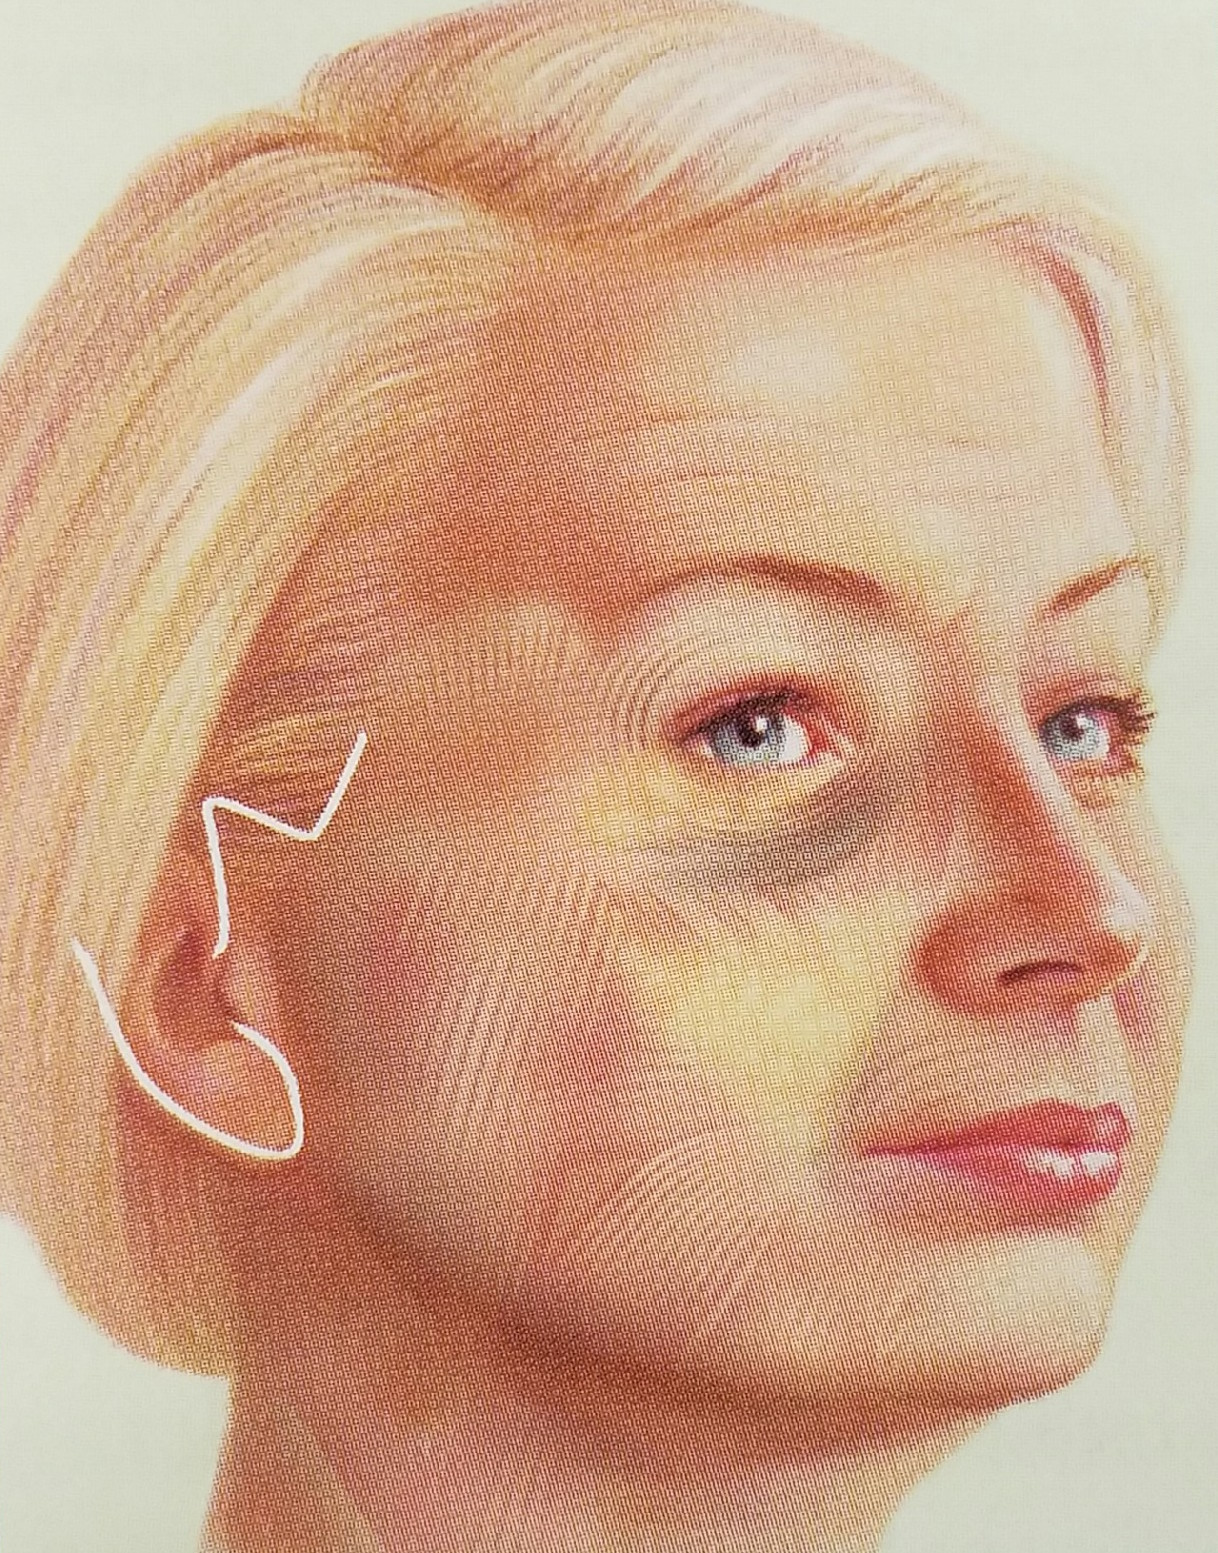 Face Procedures – Cosmetic & Reconstructive Surgery